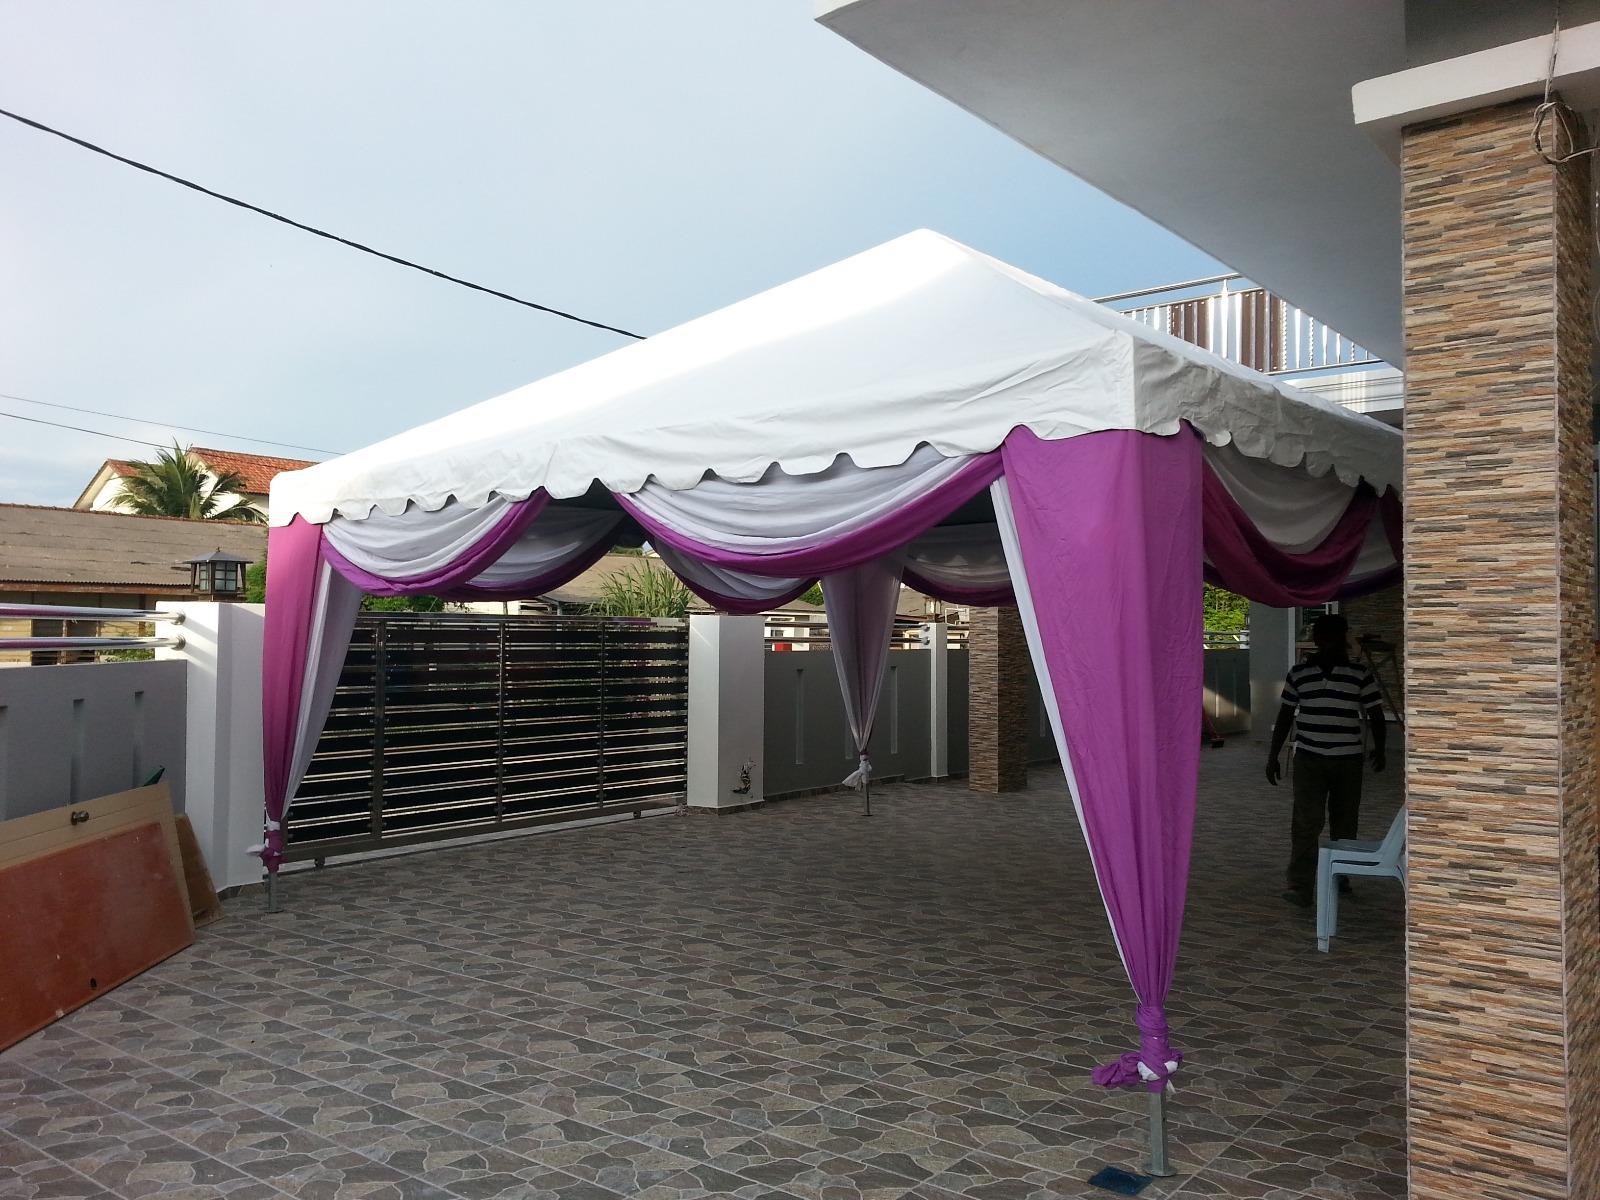 Canopy Rental Services – RJ